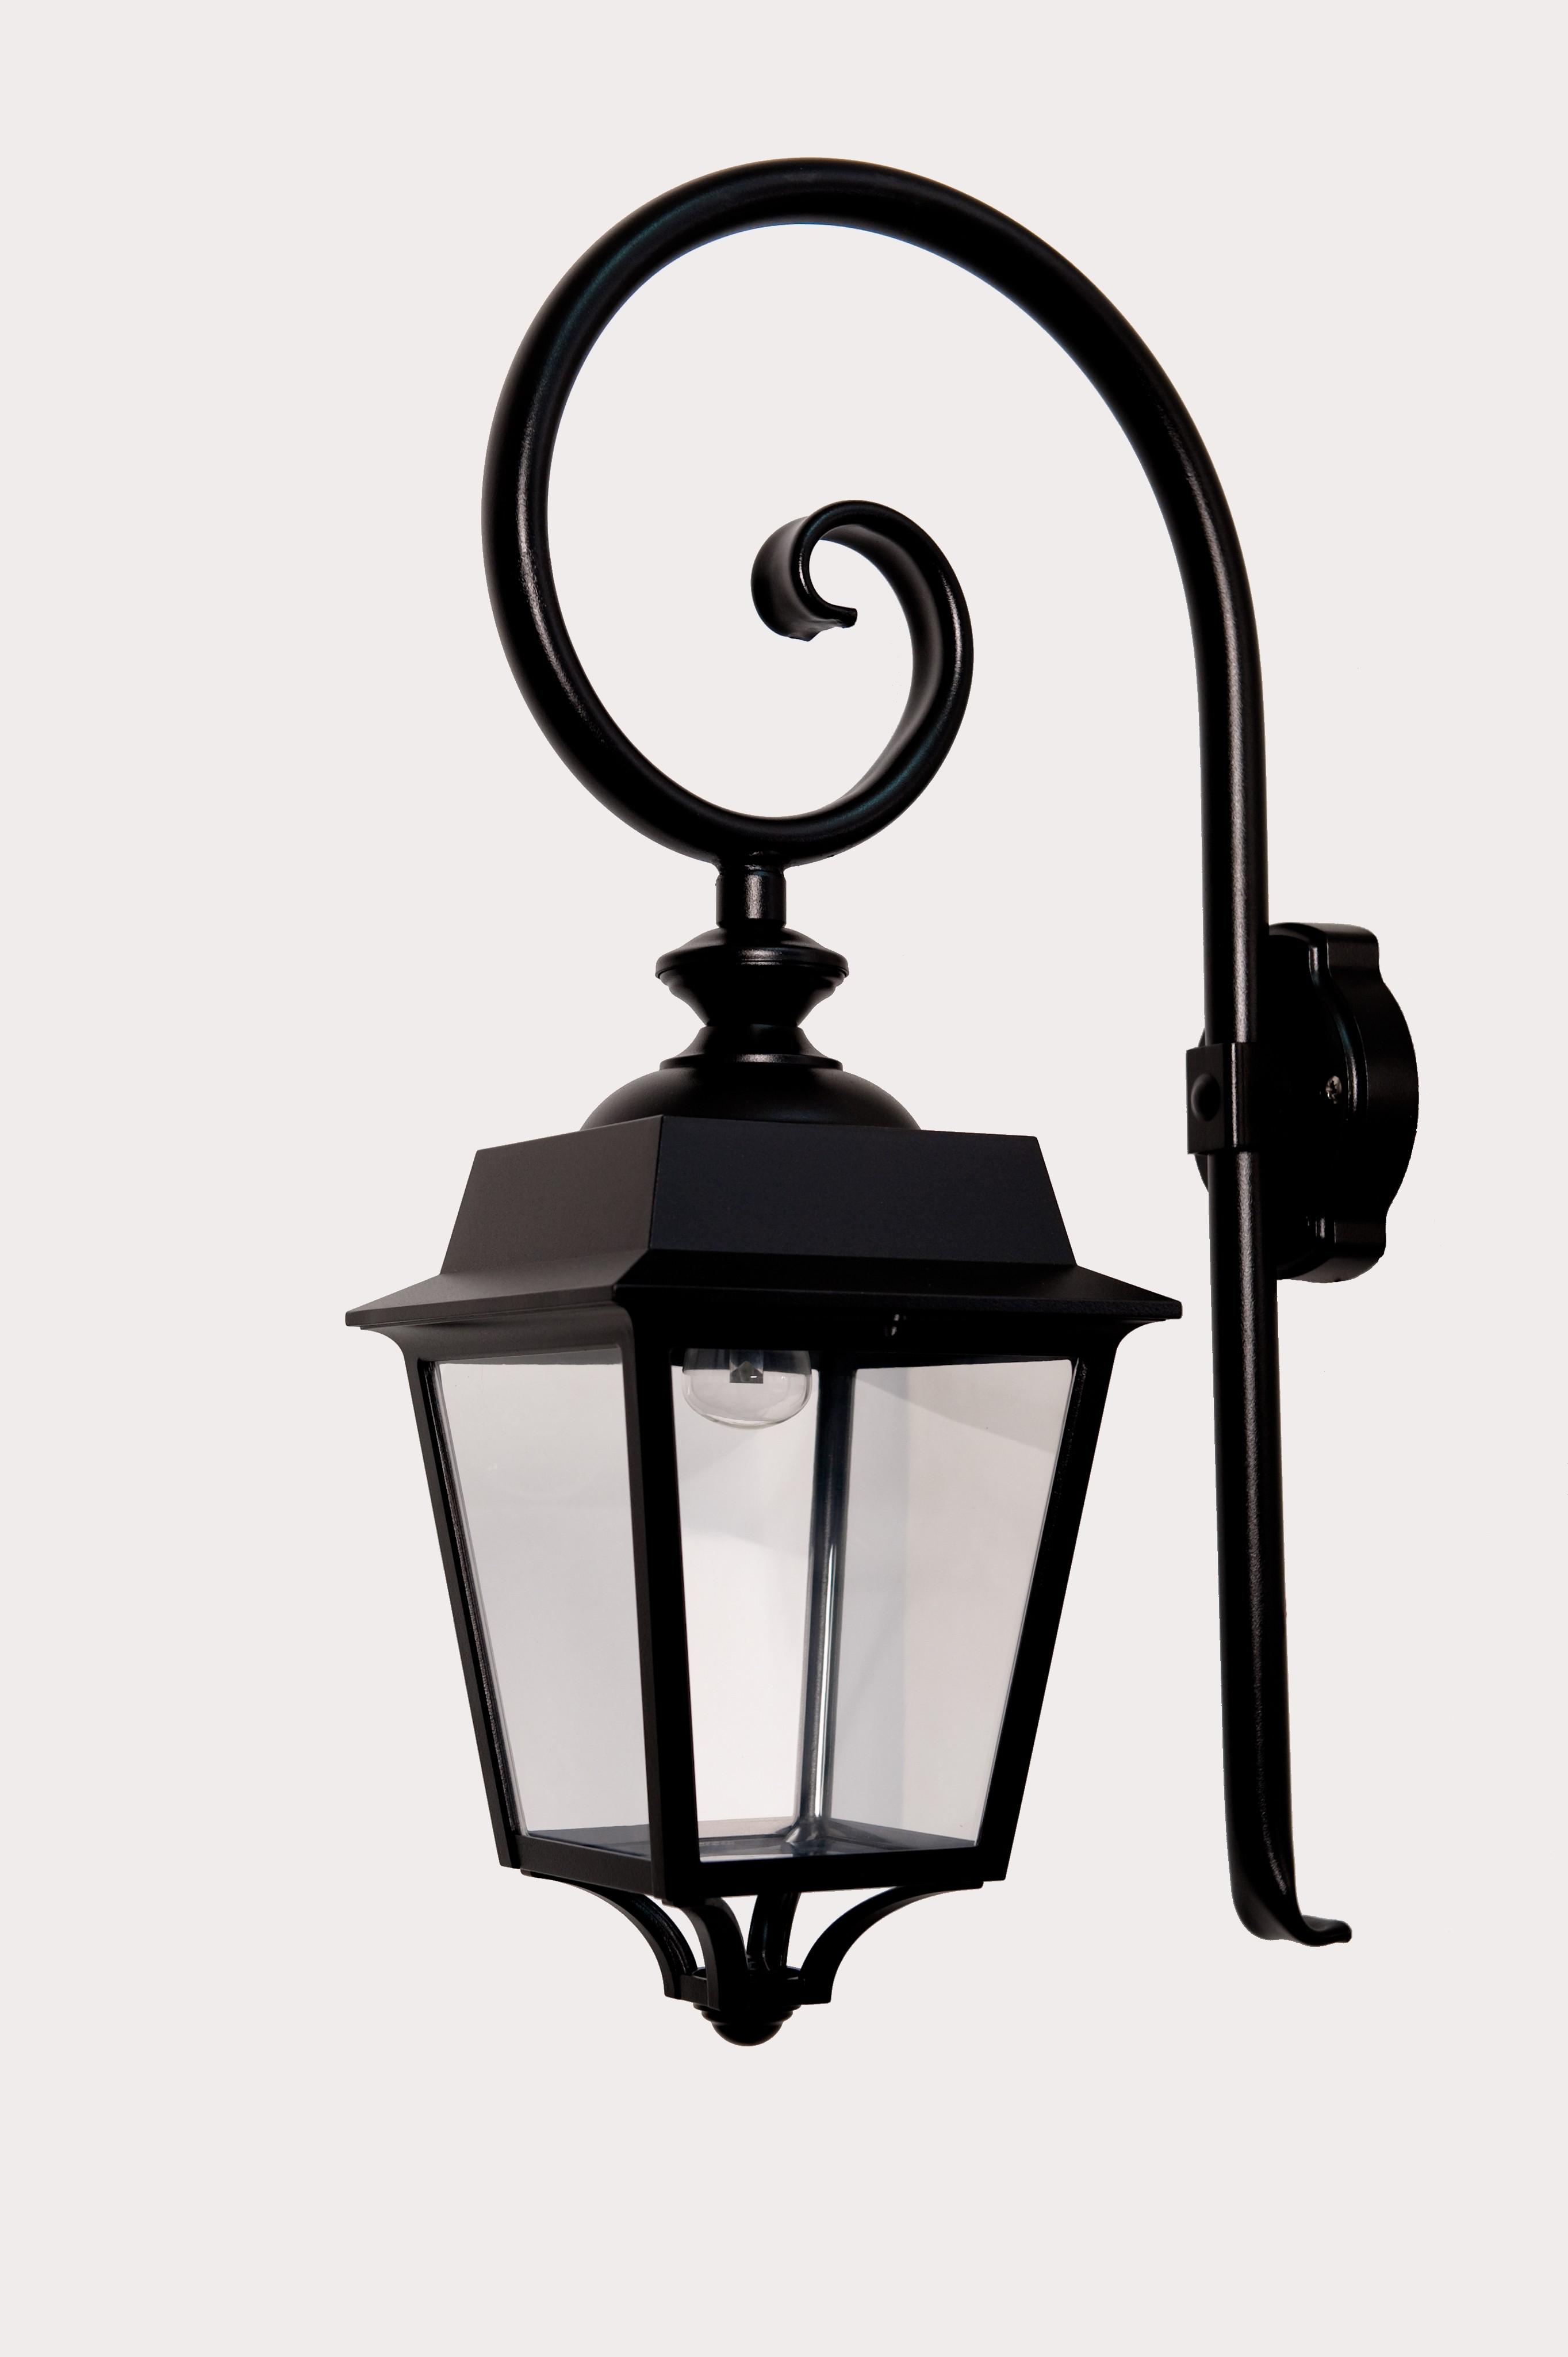 30 beau roger pradier luminaire shdy7 luminaire salon. Black Bedroom Furniture Sets. Home Design Ideas